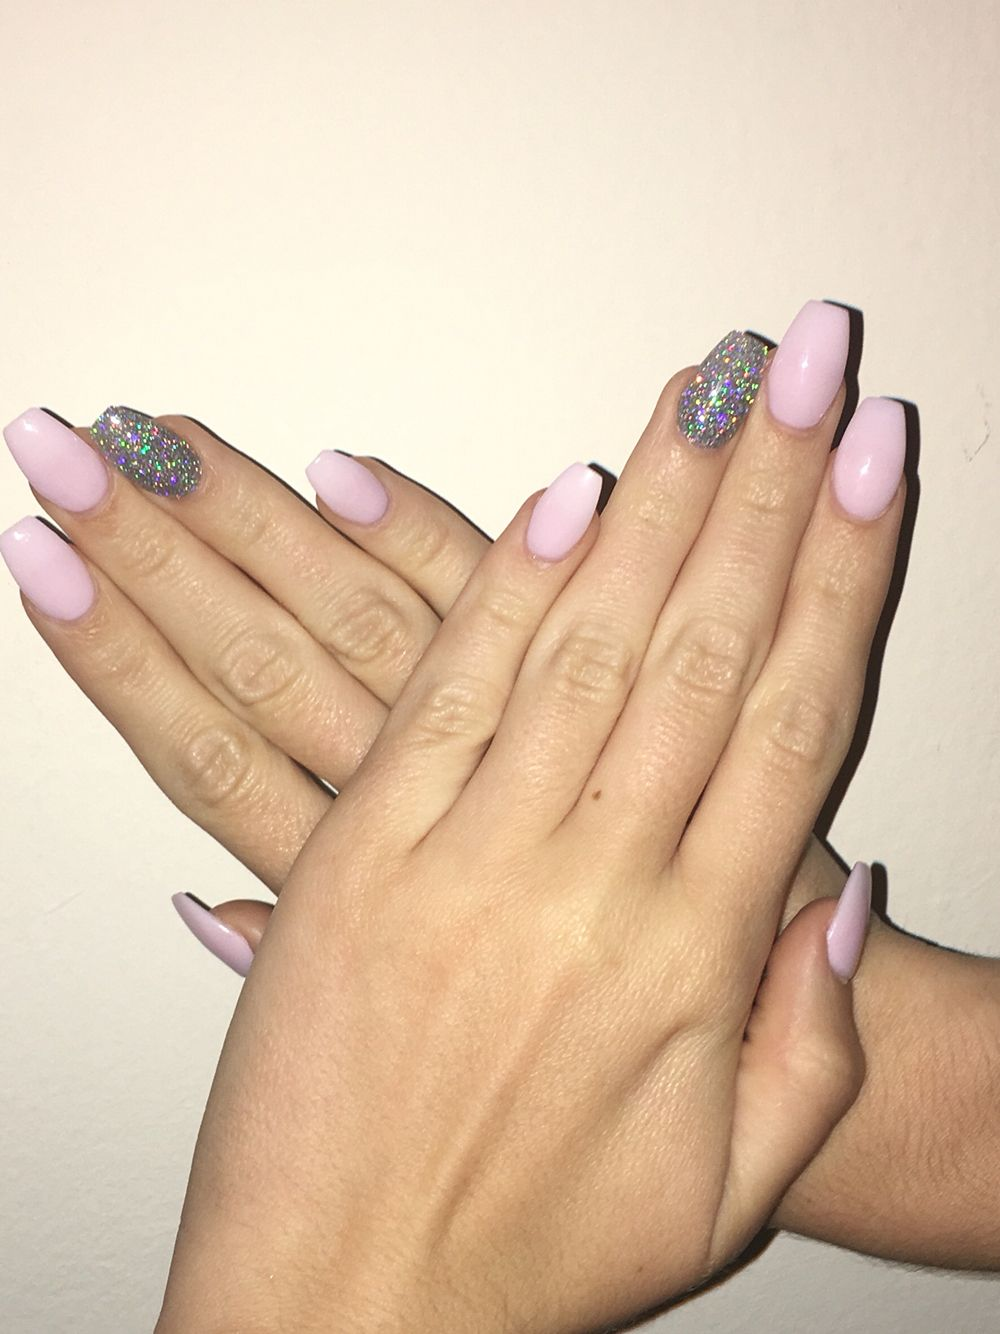 Ballerina/ coffin nails #ballerina #nails #coffin #shape #minimal ...